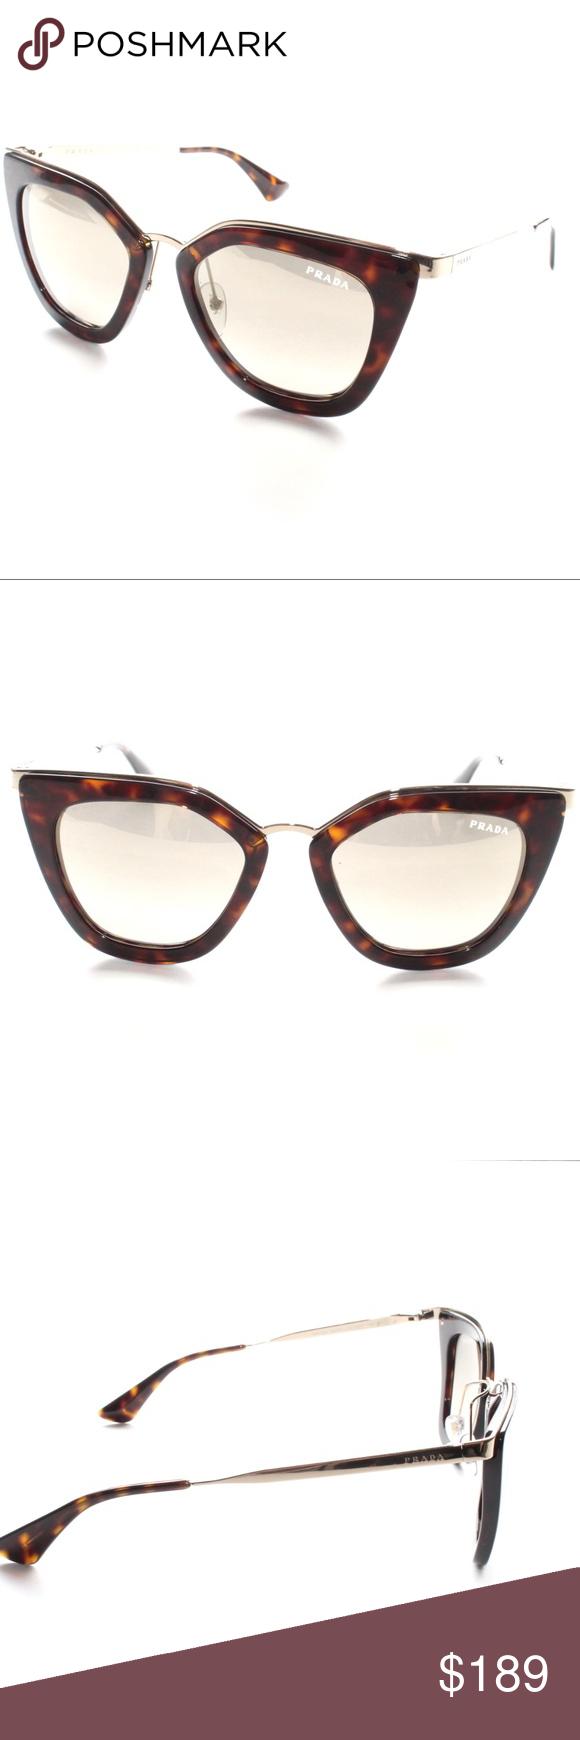 d4463dbe6e67 ... get prada sunglasses spr 53s 2au 3d0 havana gold brown brand new 100  authentic 7f8a0 99320 ...